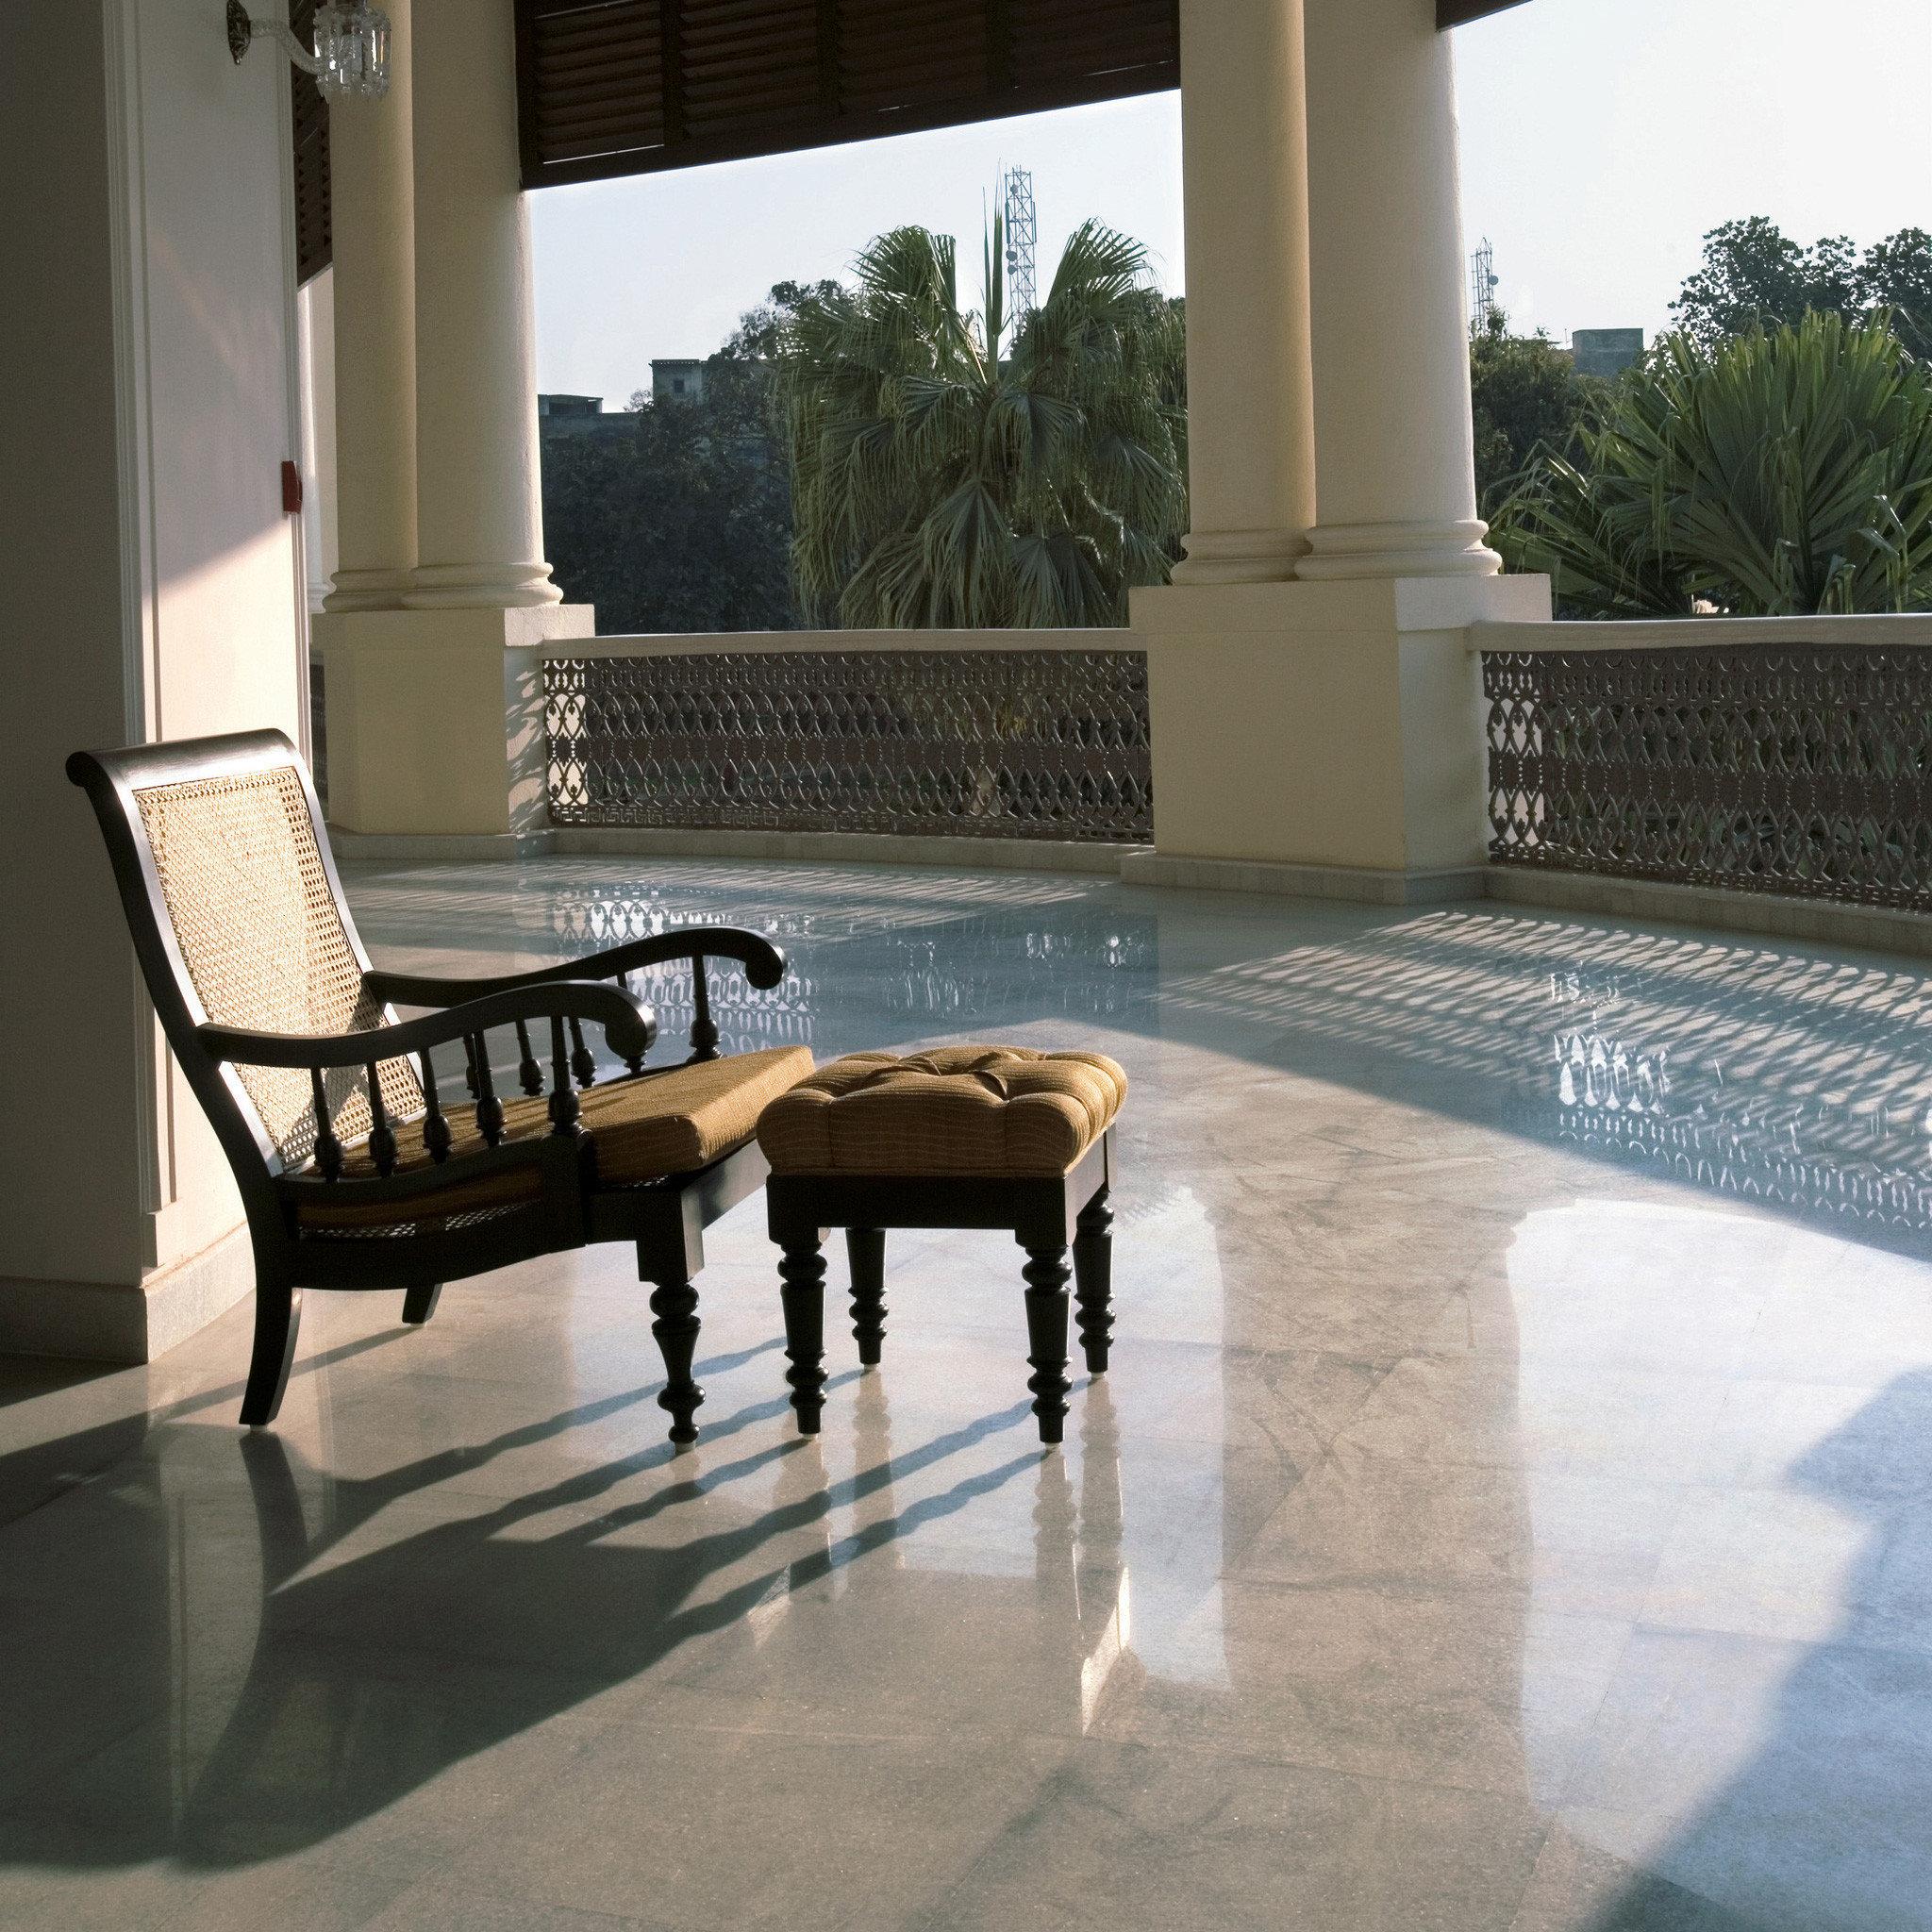 Balcony Elegant Lounge Luxury Resort Scenic views property building flooring home living room Villa colonnade